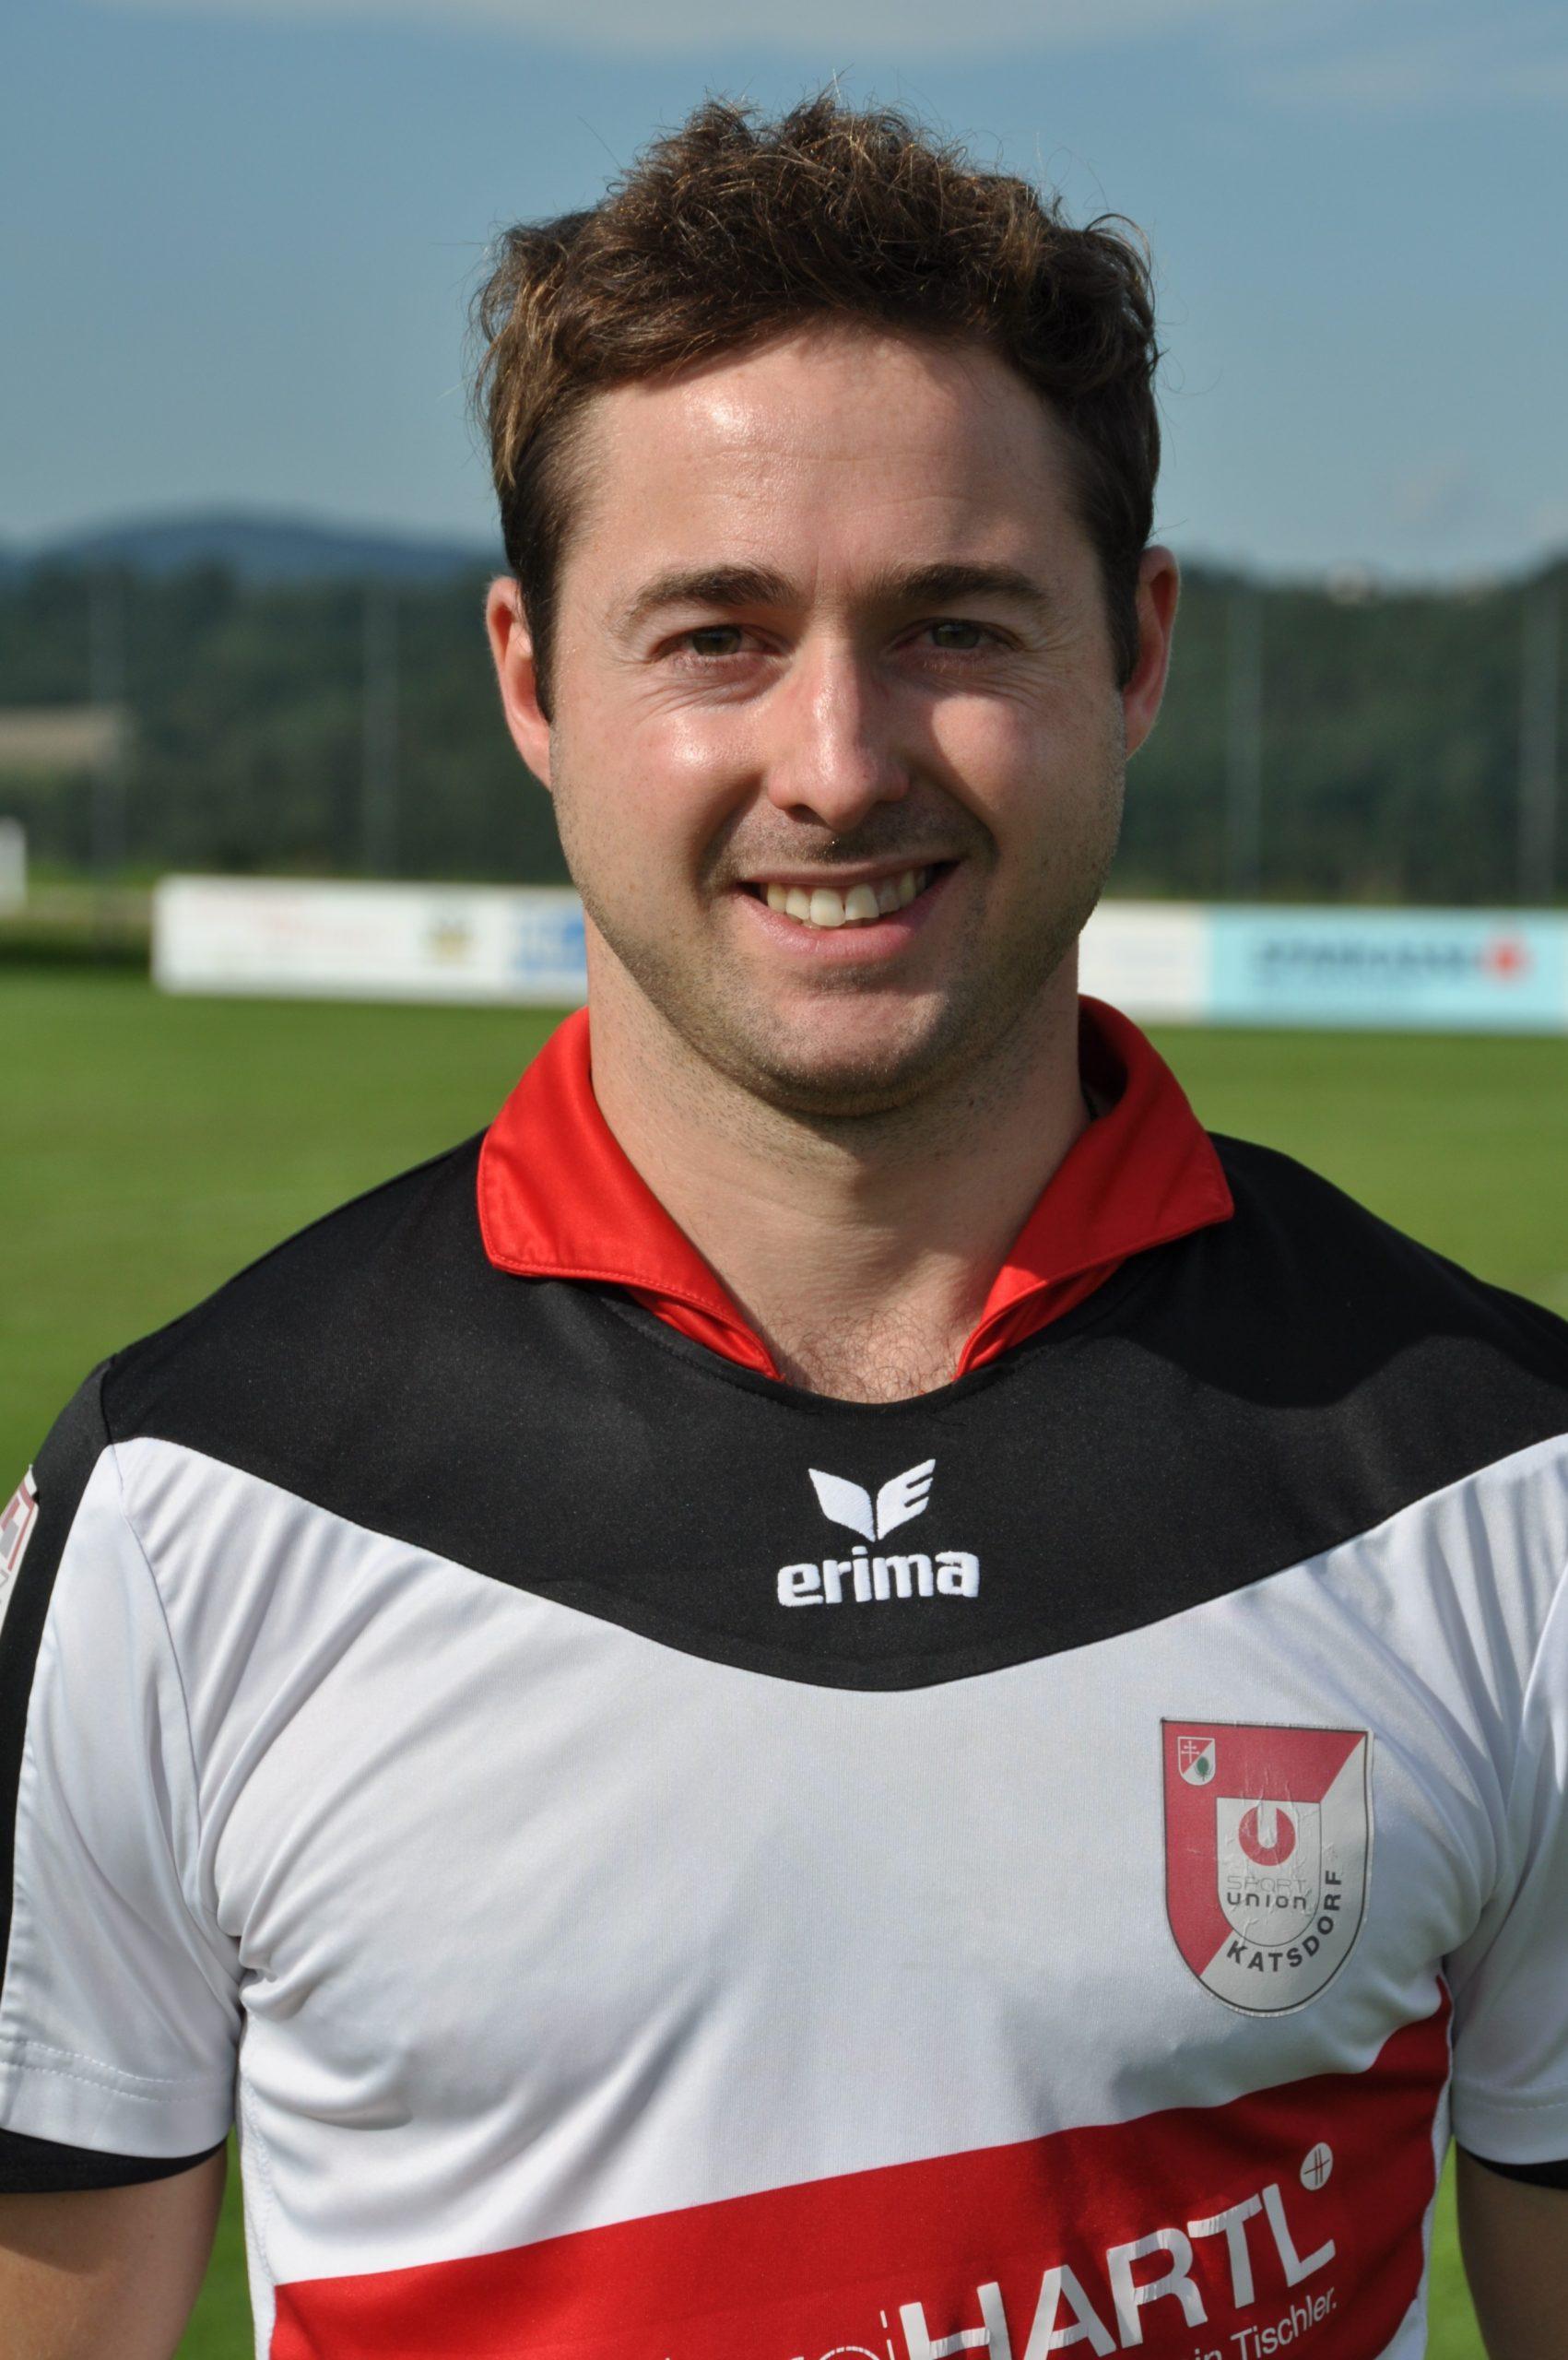 Union Katsdorf - Daniel Brandstetter